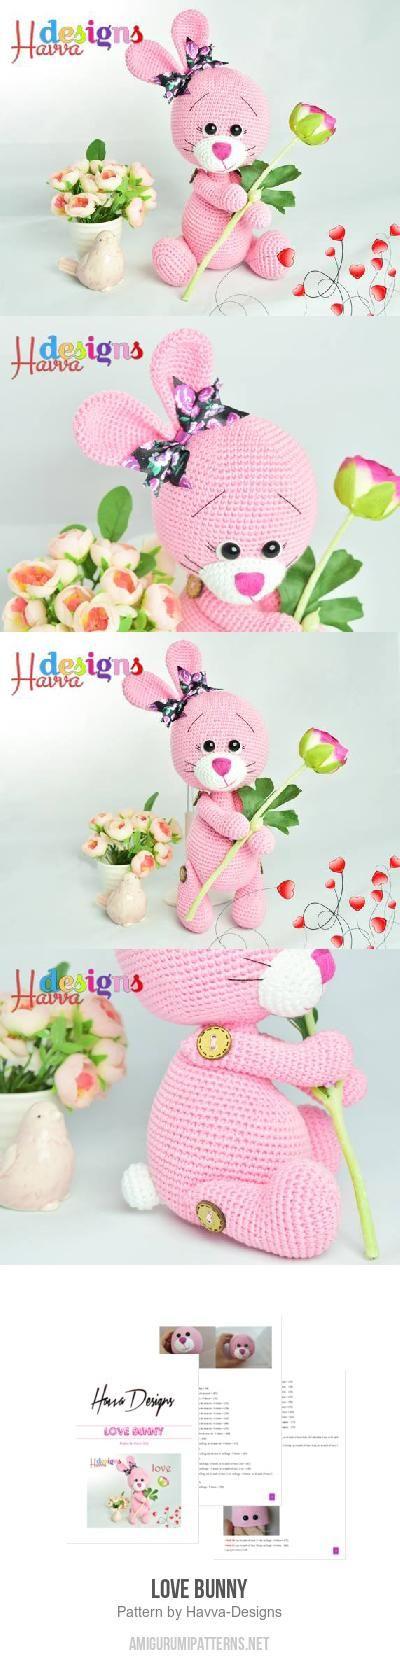 Love Bunny amigurumi pattern